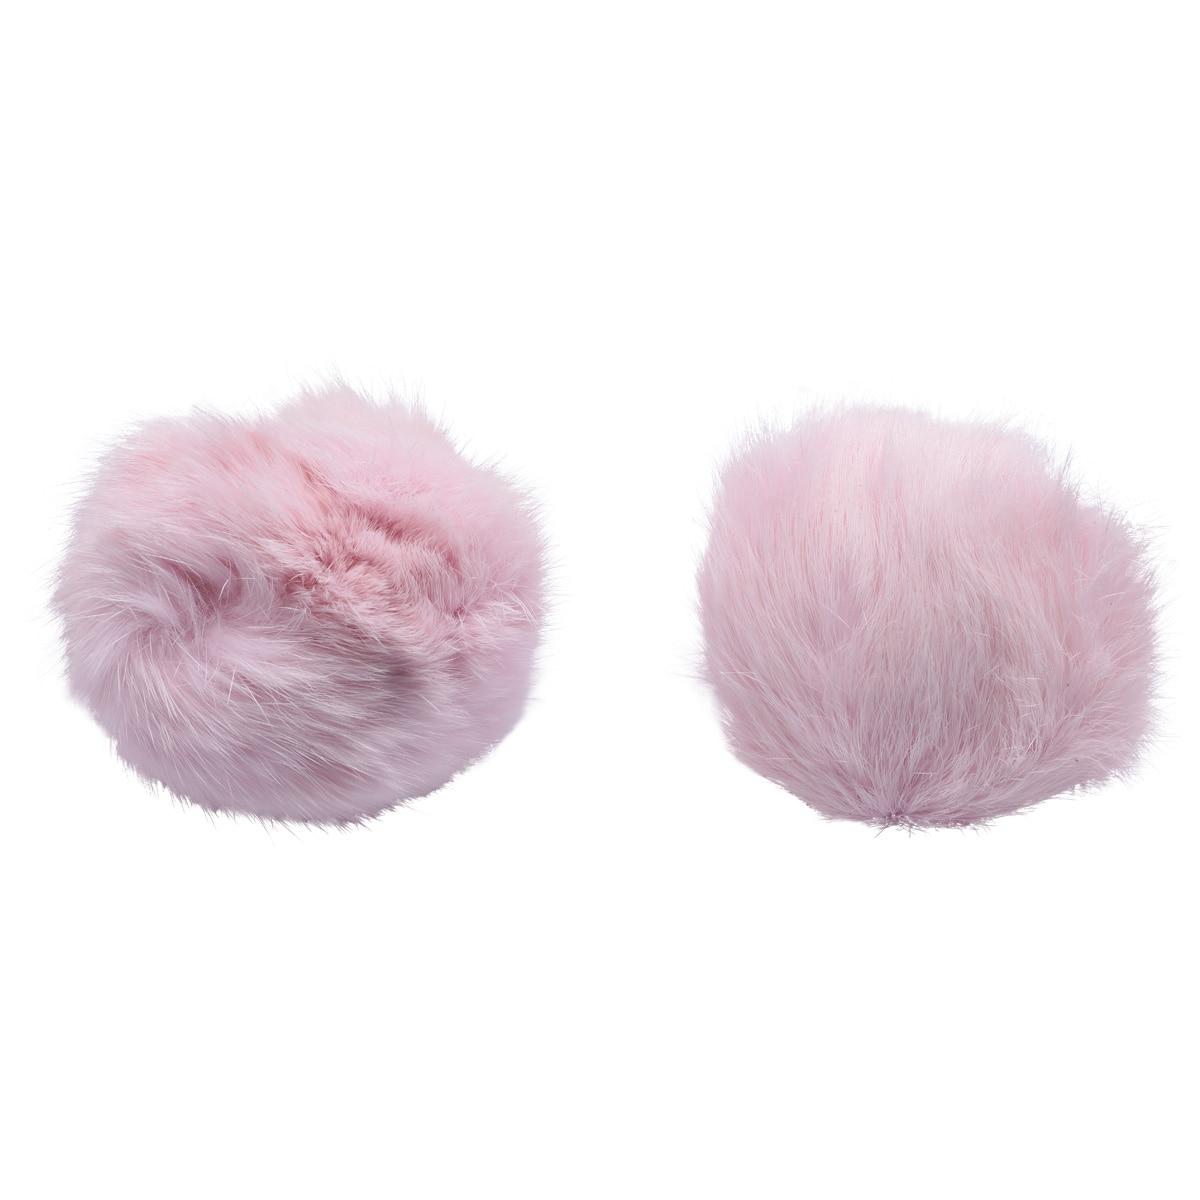 Pompon Made Of Natural Fur (rabbit), D-10cm, 2 Pcs/pack (to Pink)